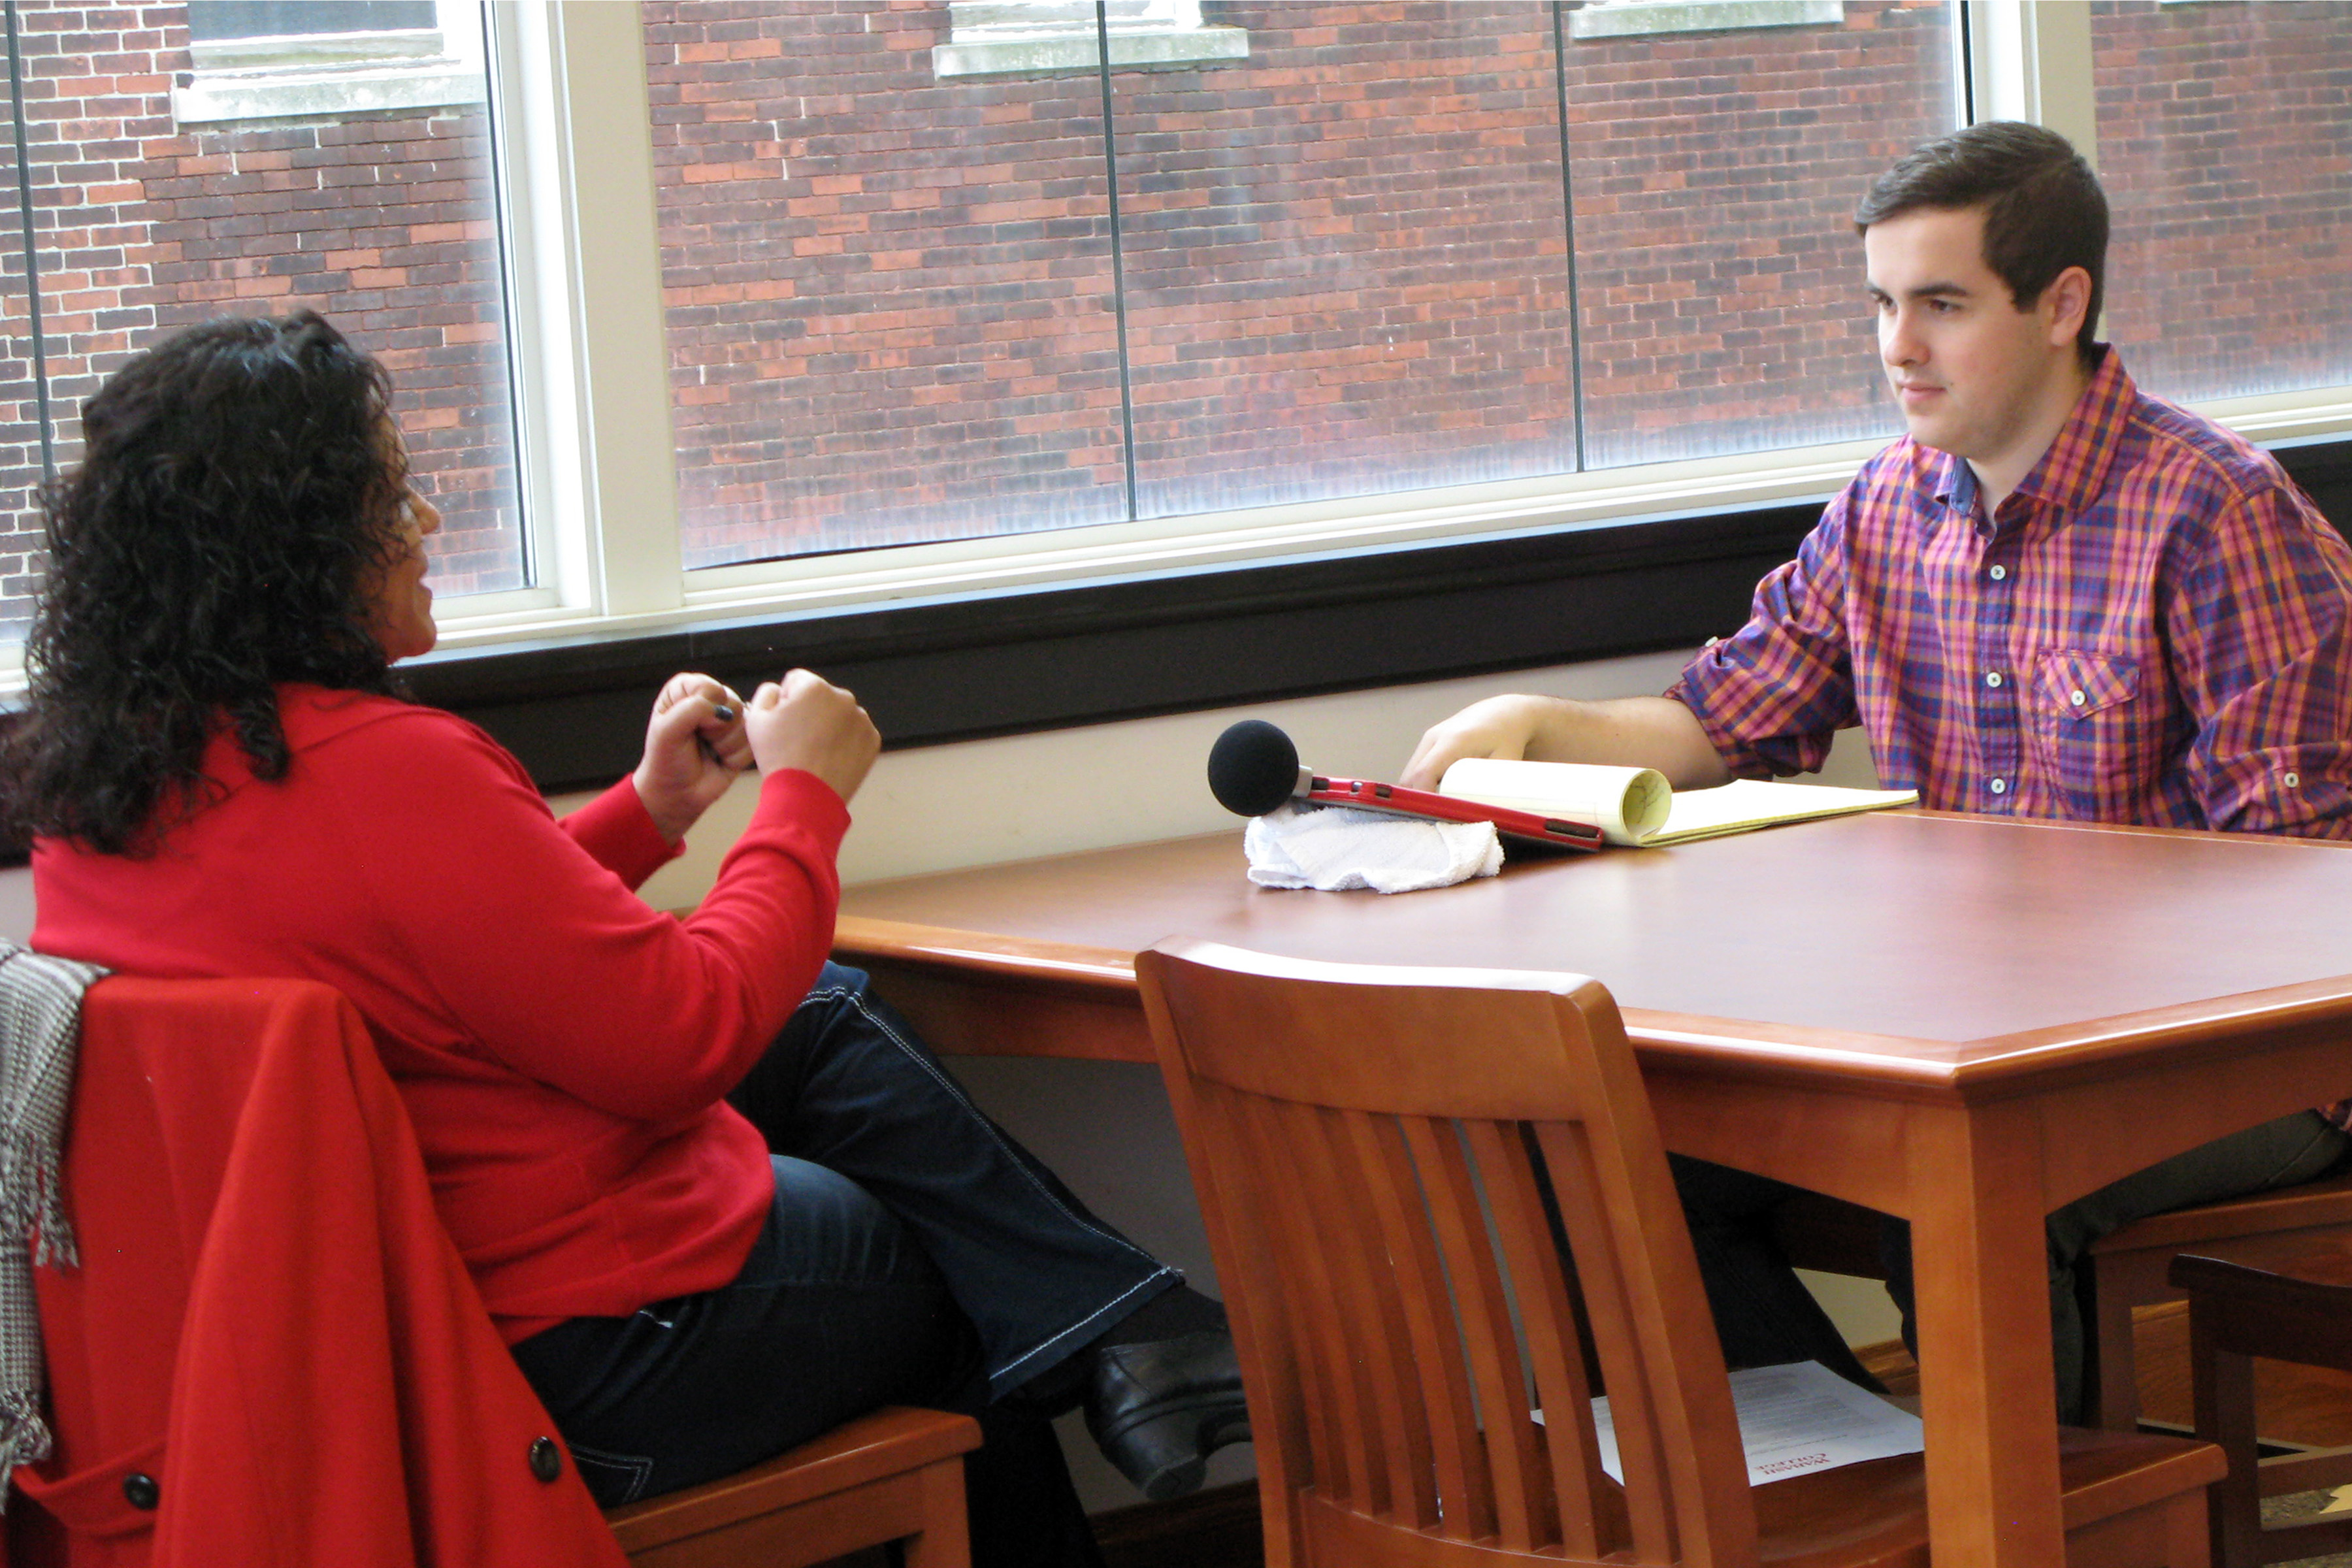 megan talking to student